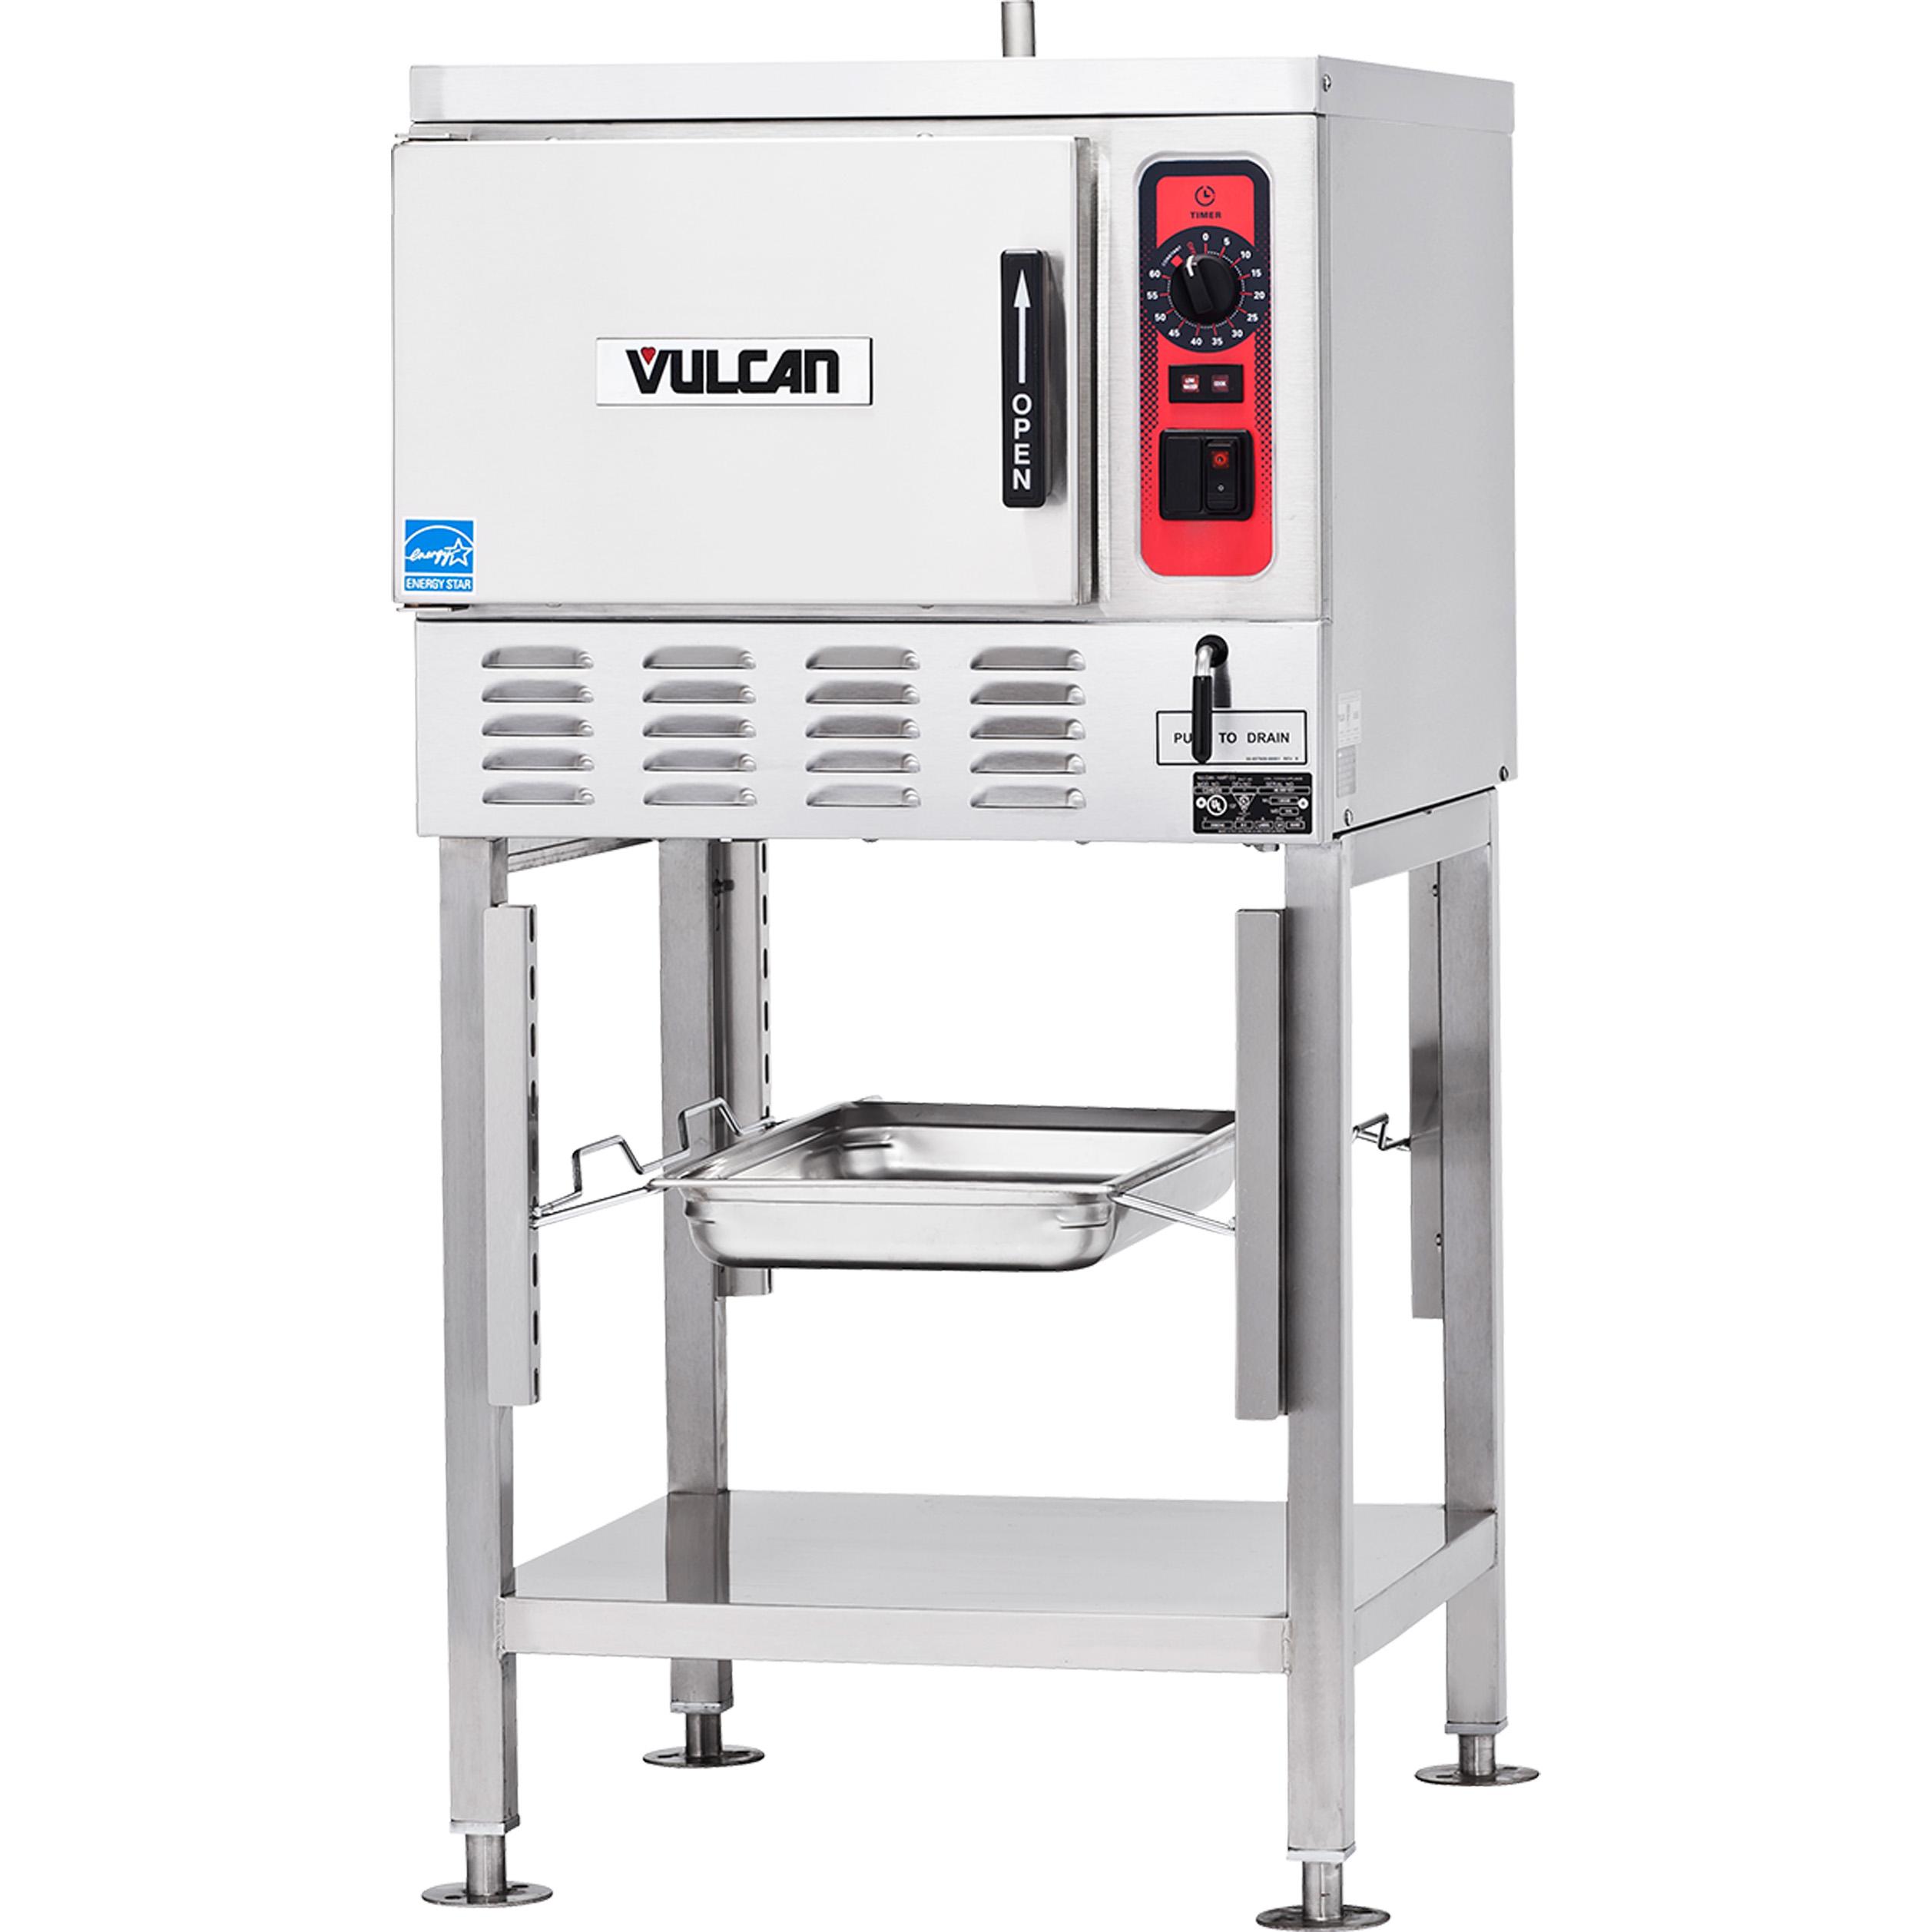 Vulcan C24EO3 steamer, convection, boilerless, countertop